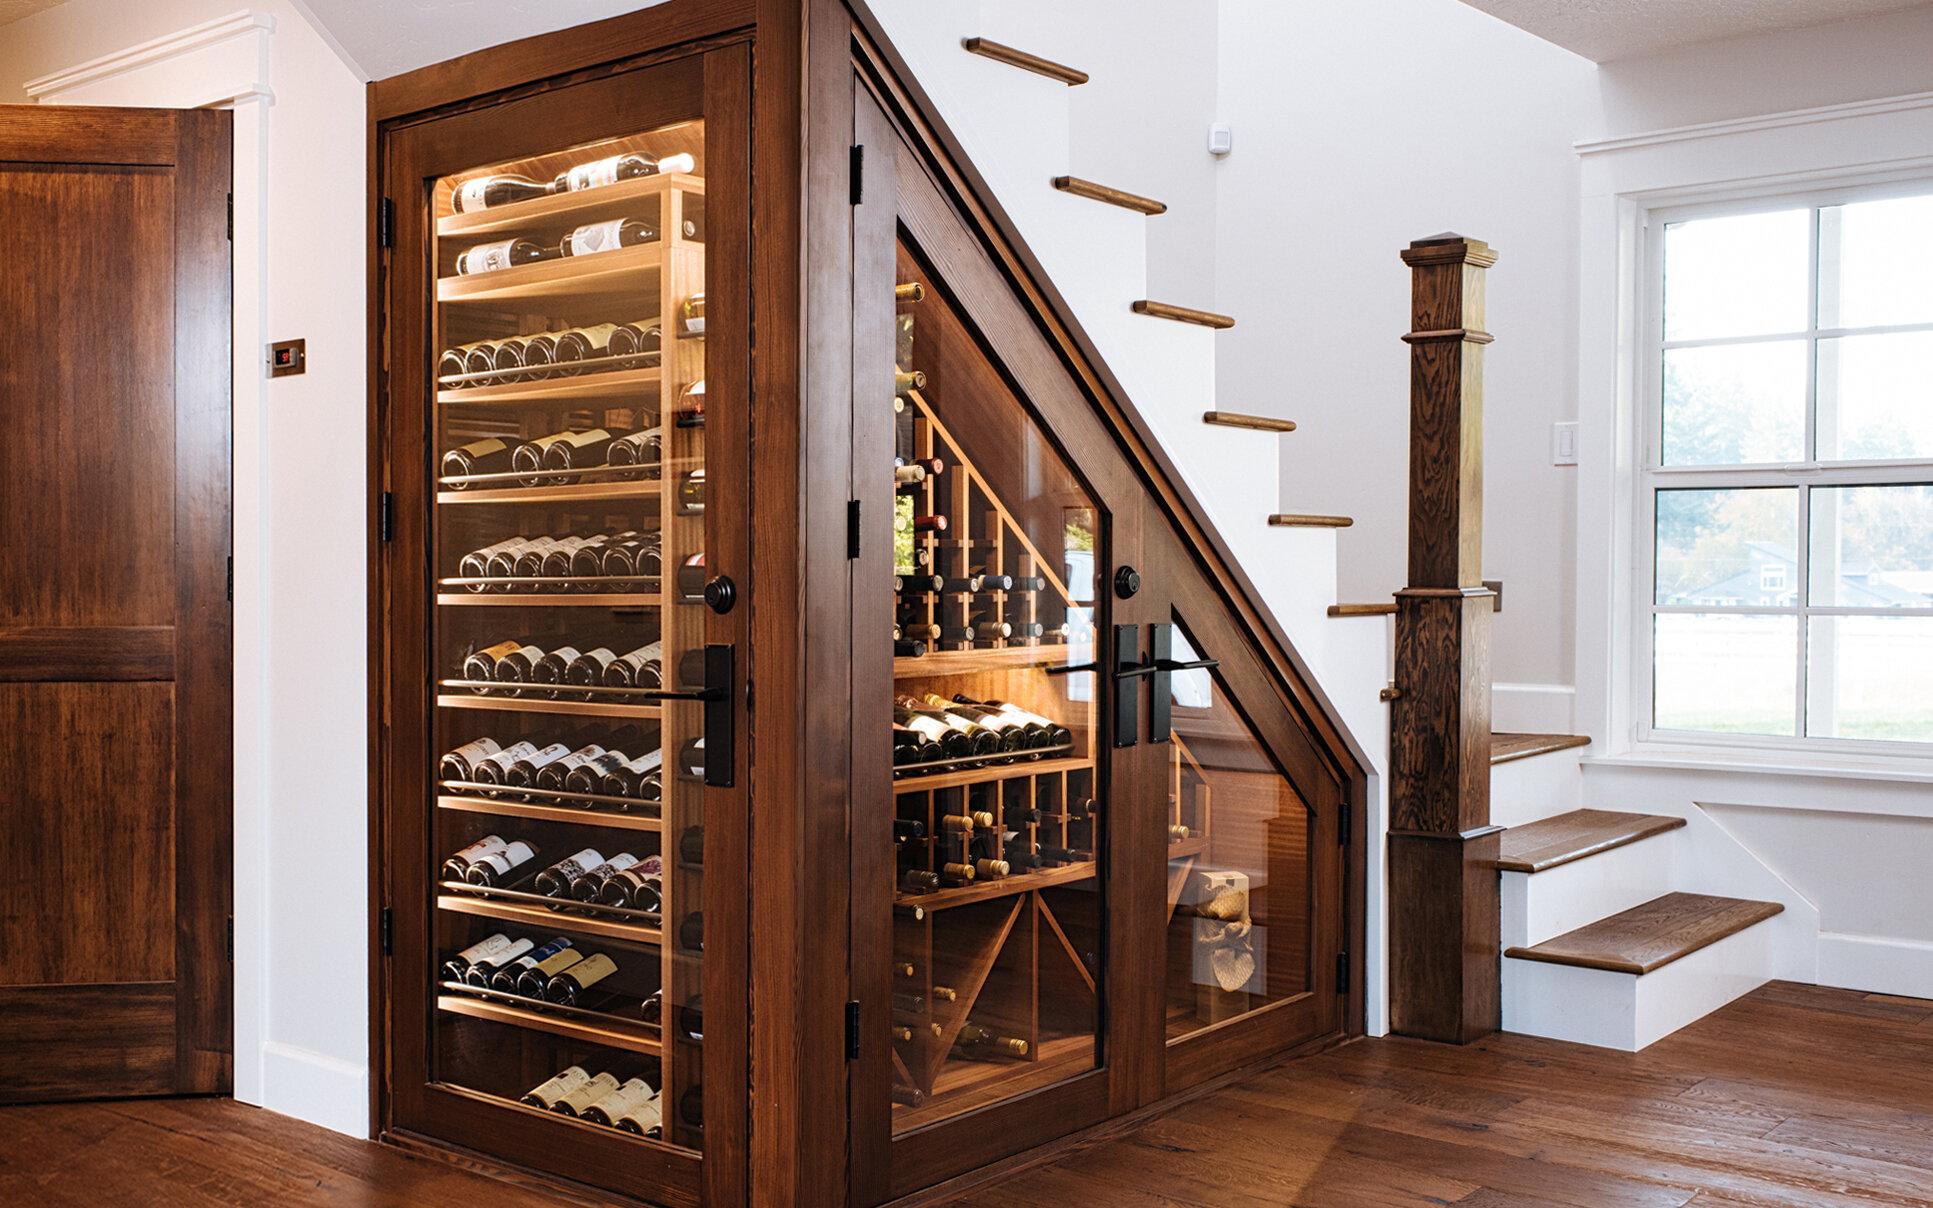 sommi-under-stairs-wine-cellar-02.jpg